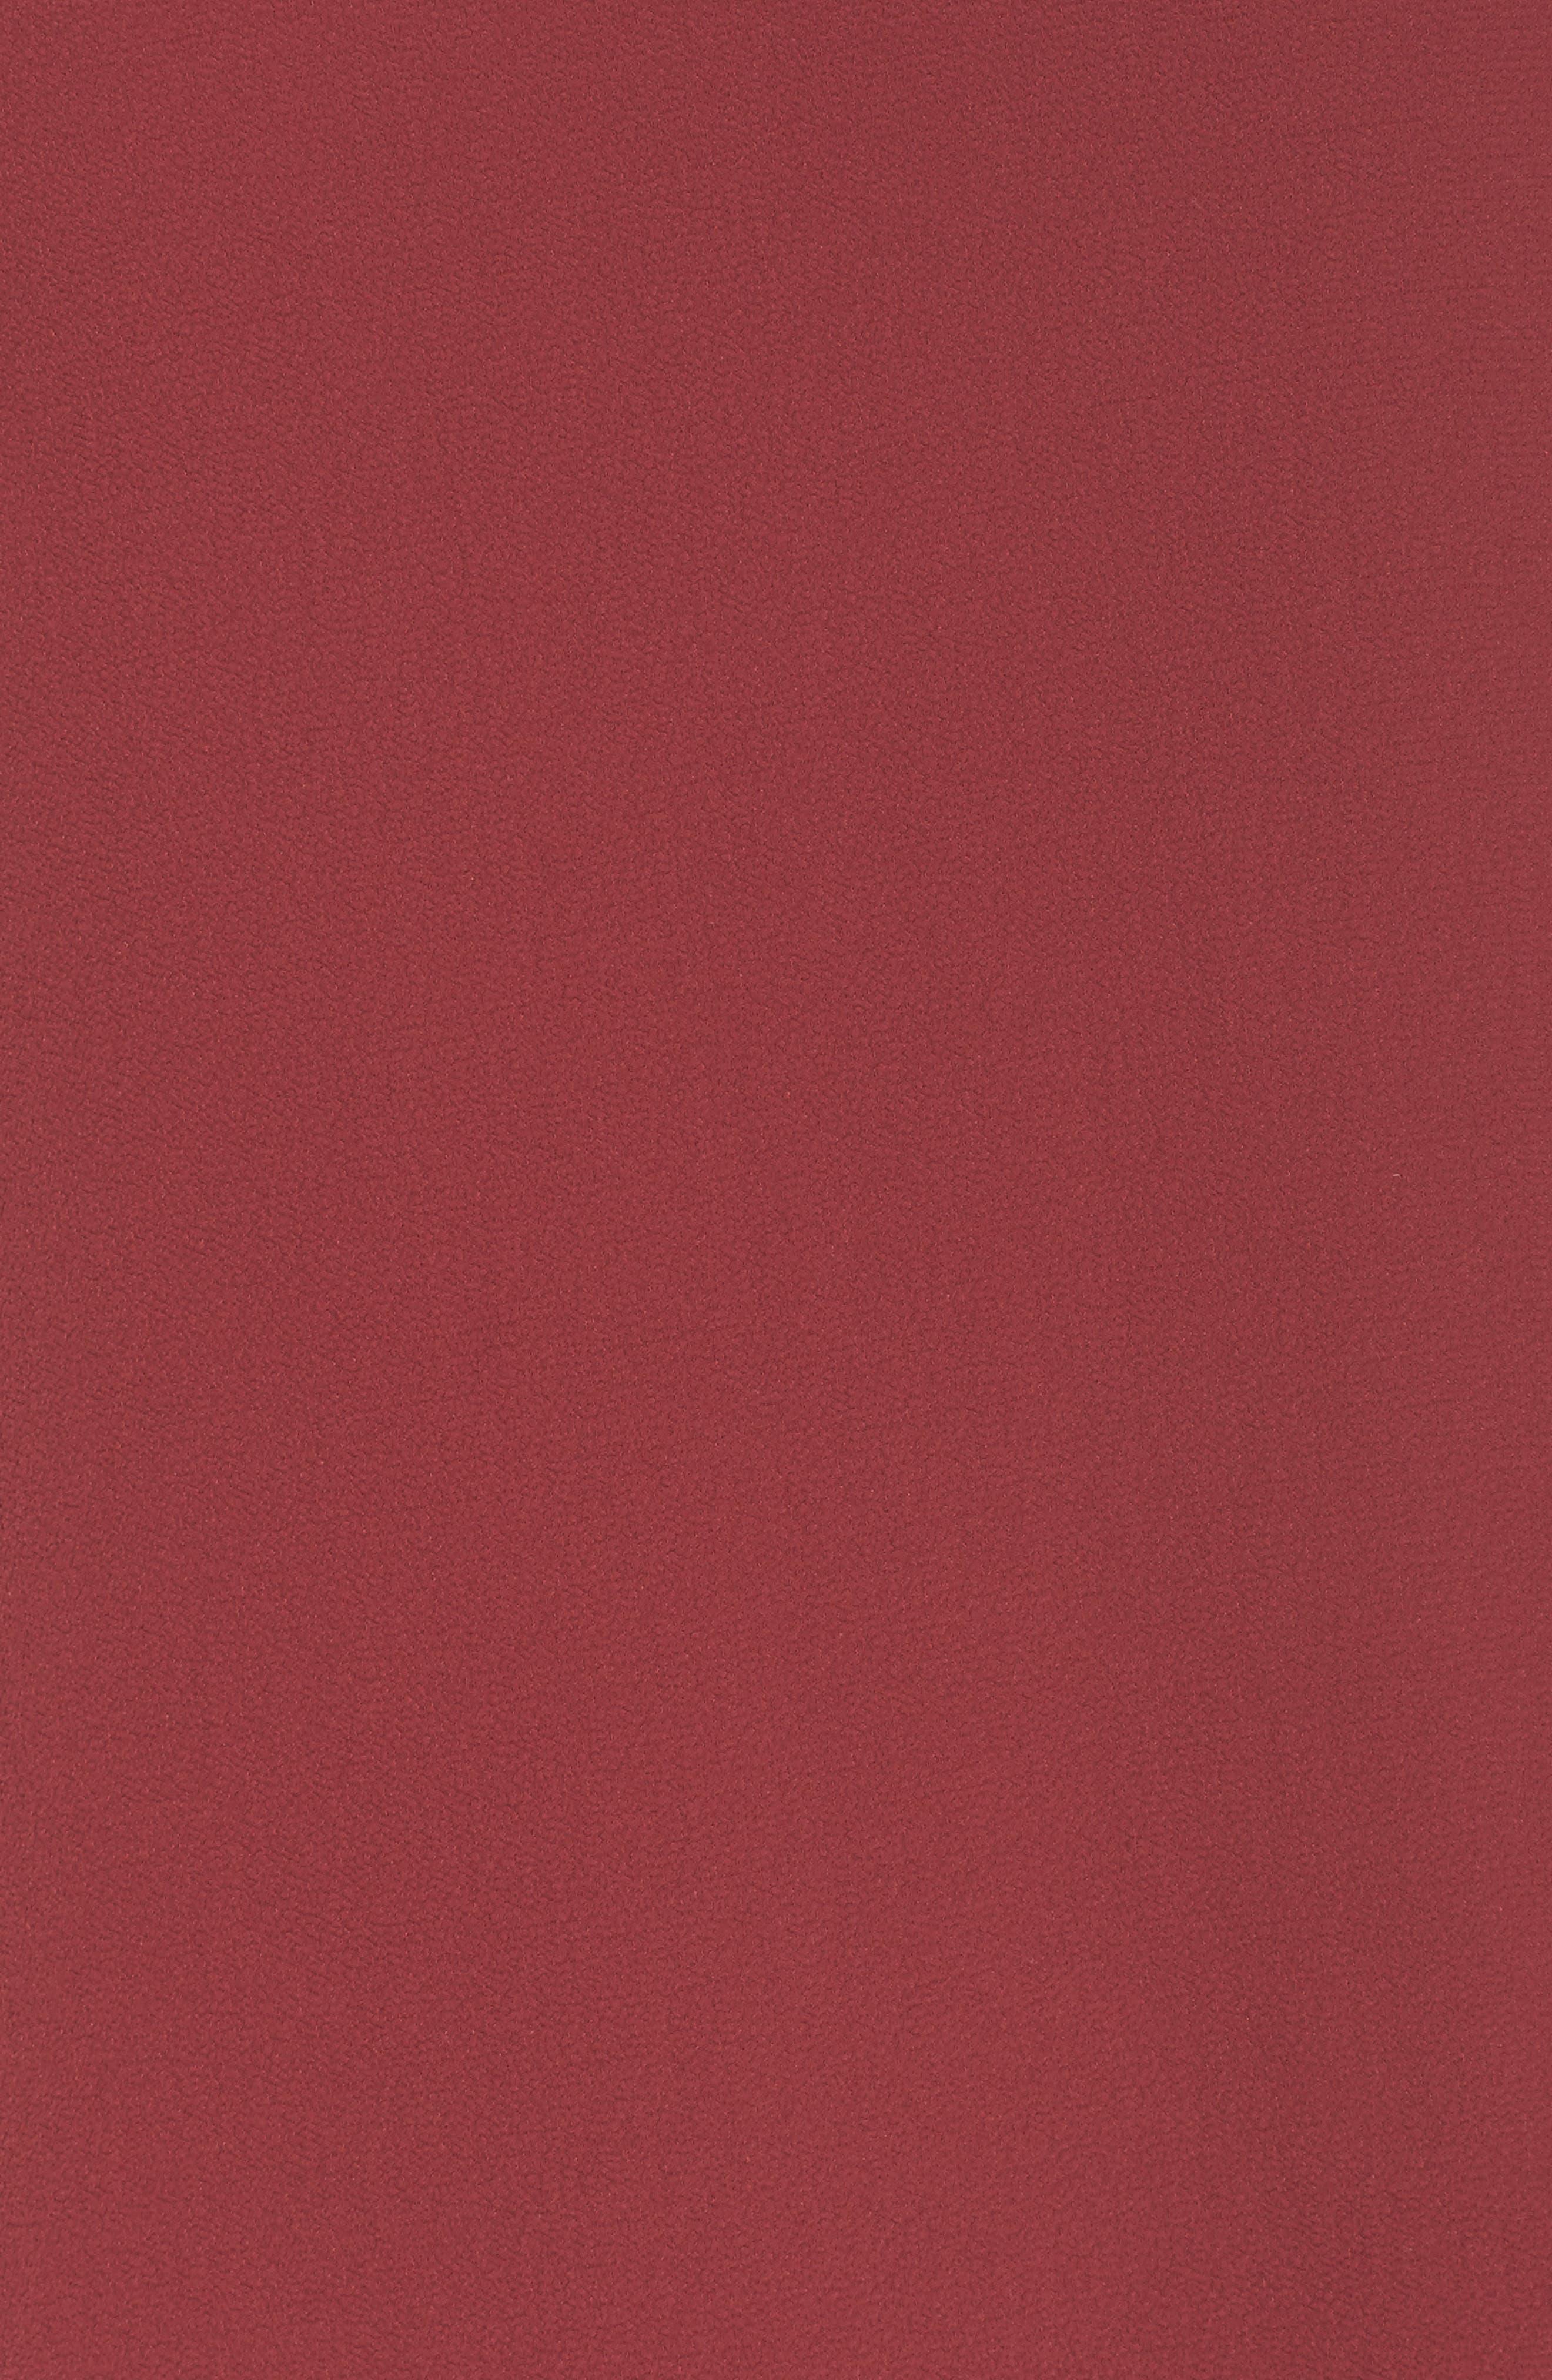 Choker Shift Dress,                             Alternate thumbnail 5, color,                             934